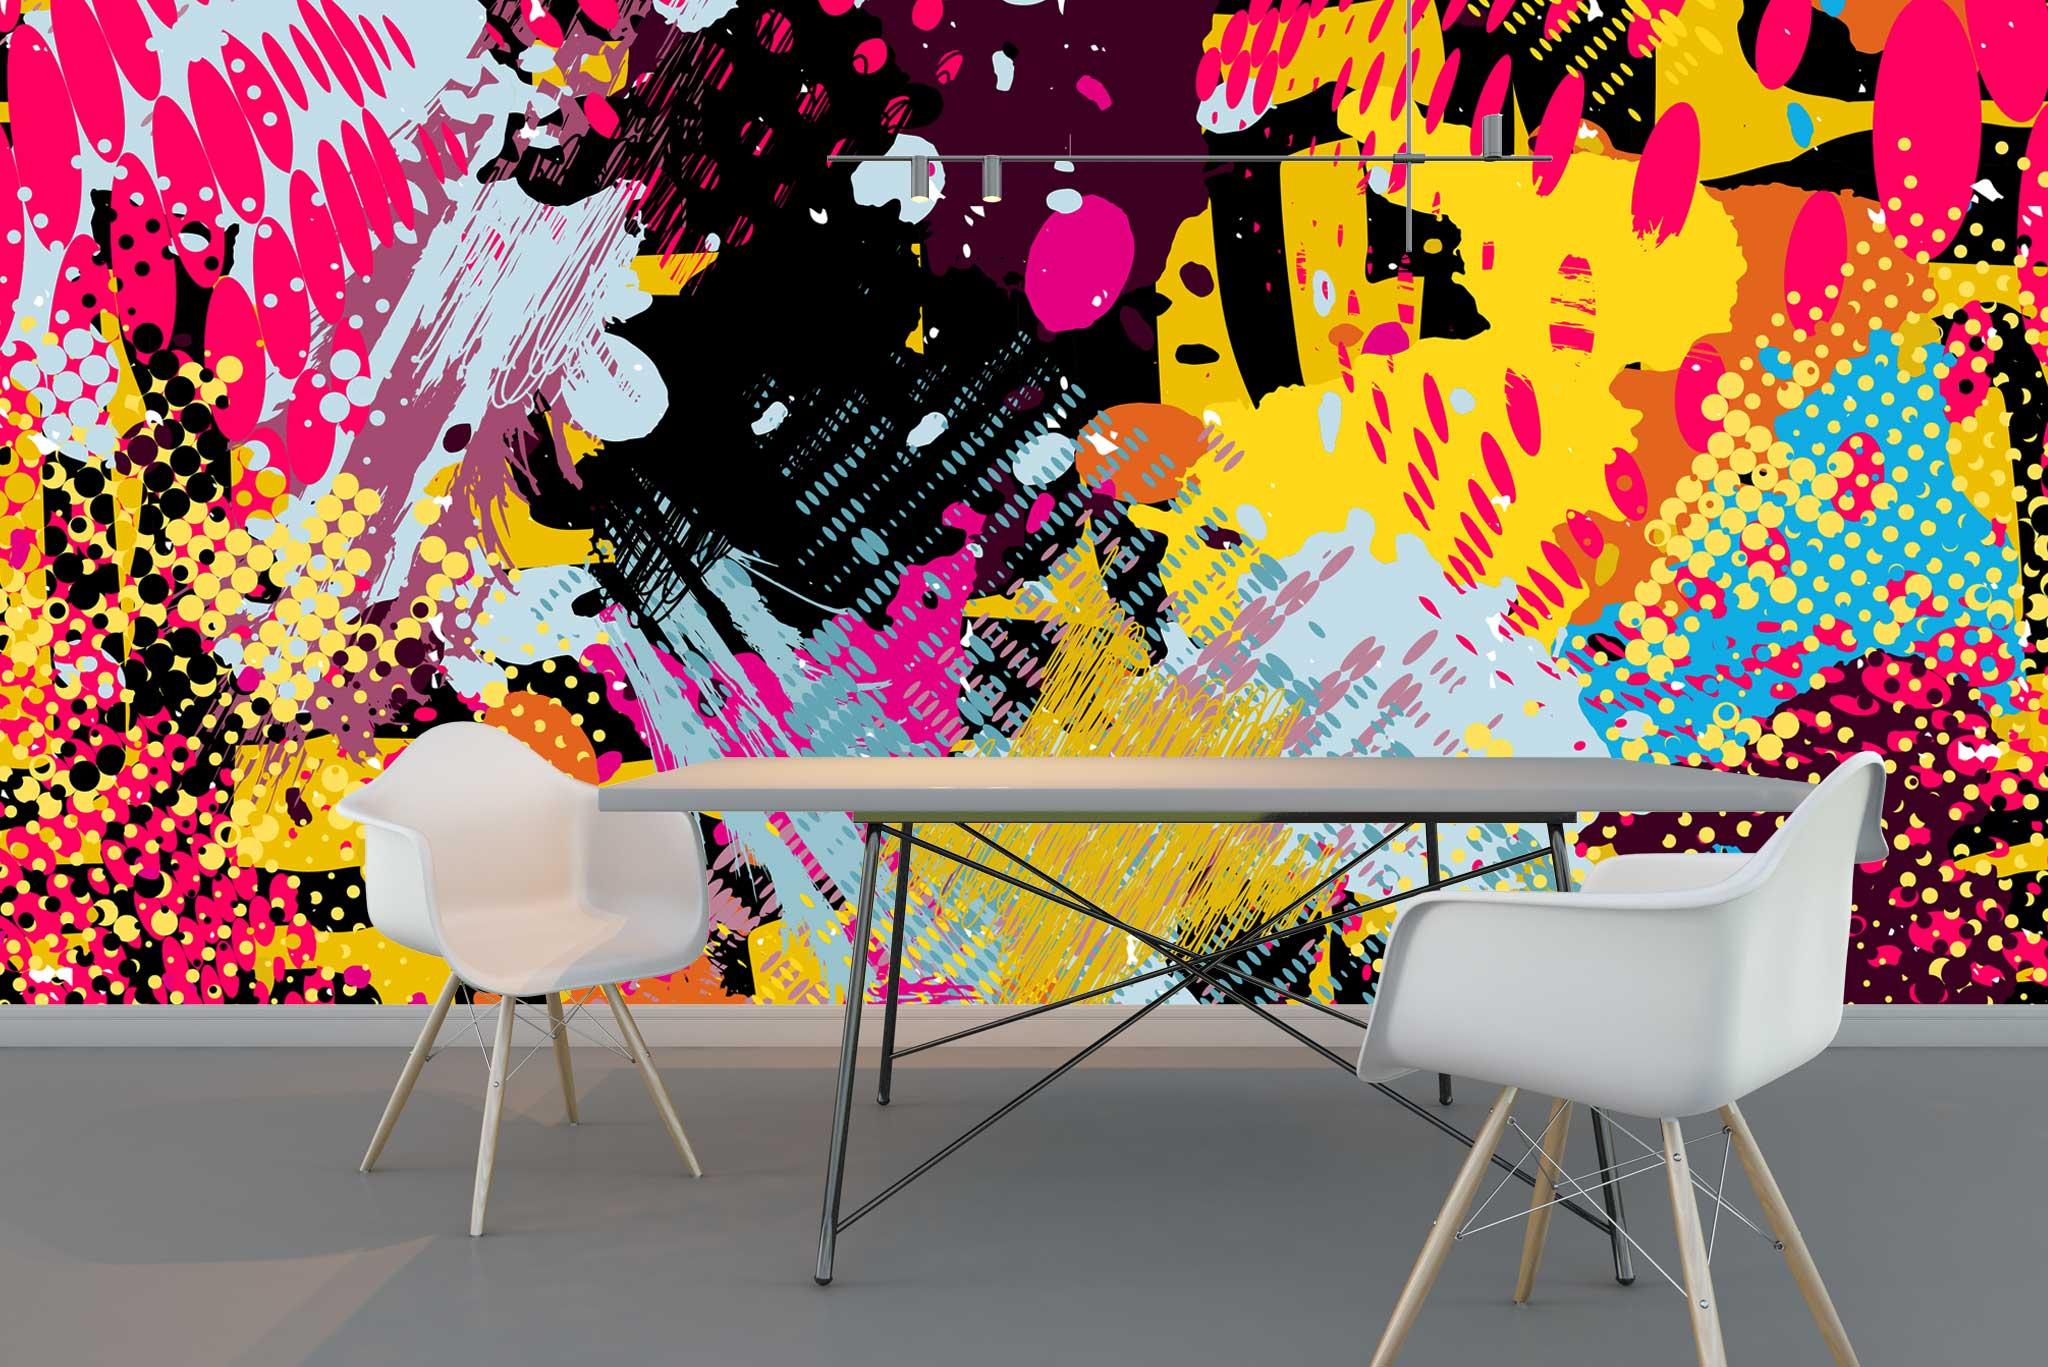 tapet-fototapet-comanda-personalizat-bucuresti-perete-special-lux-model-desen-grafic-pop-art-graffitti-multicolor